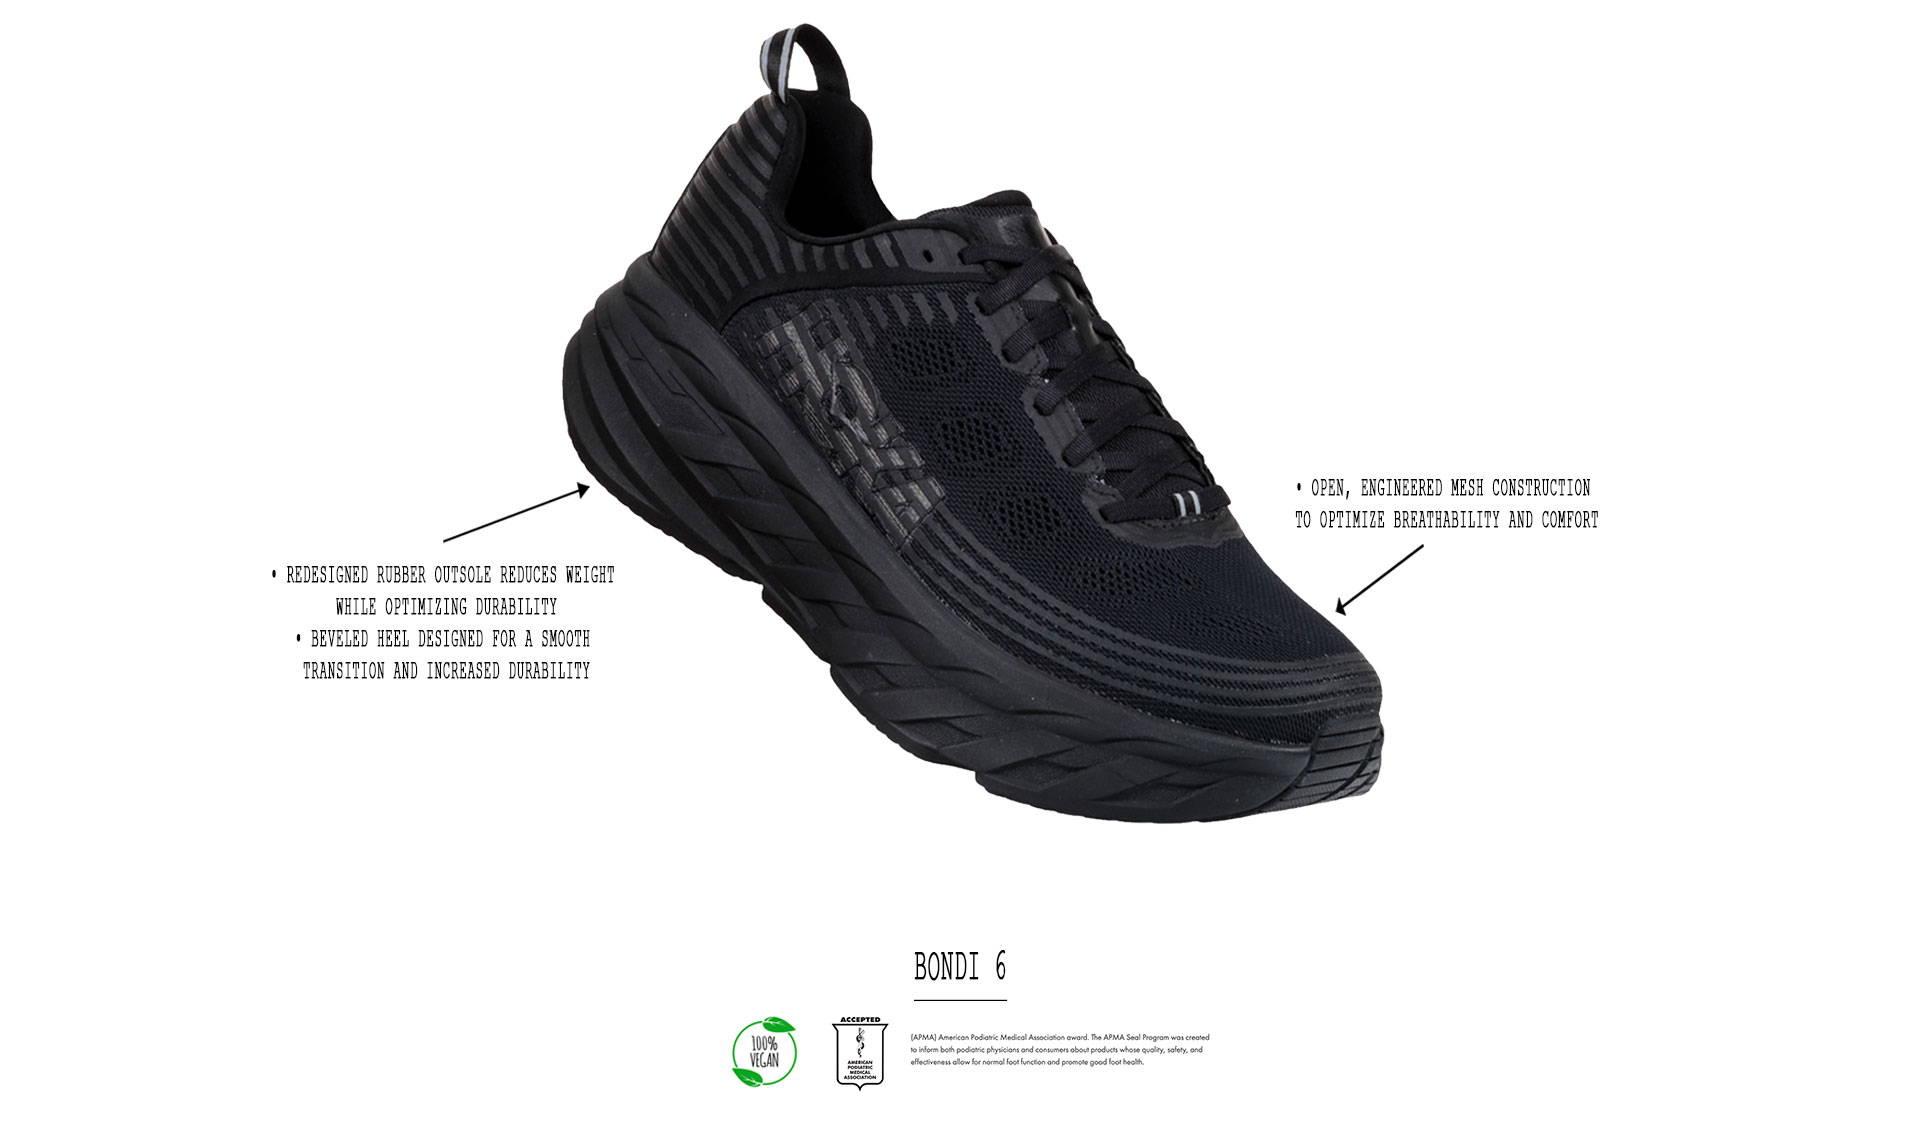 Shop Hoka One One Bondi 6 Shoes Online